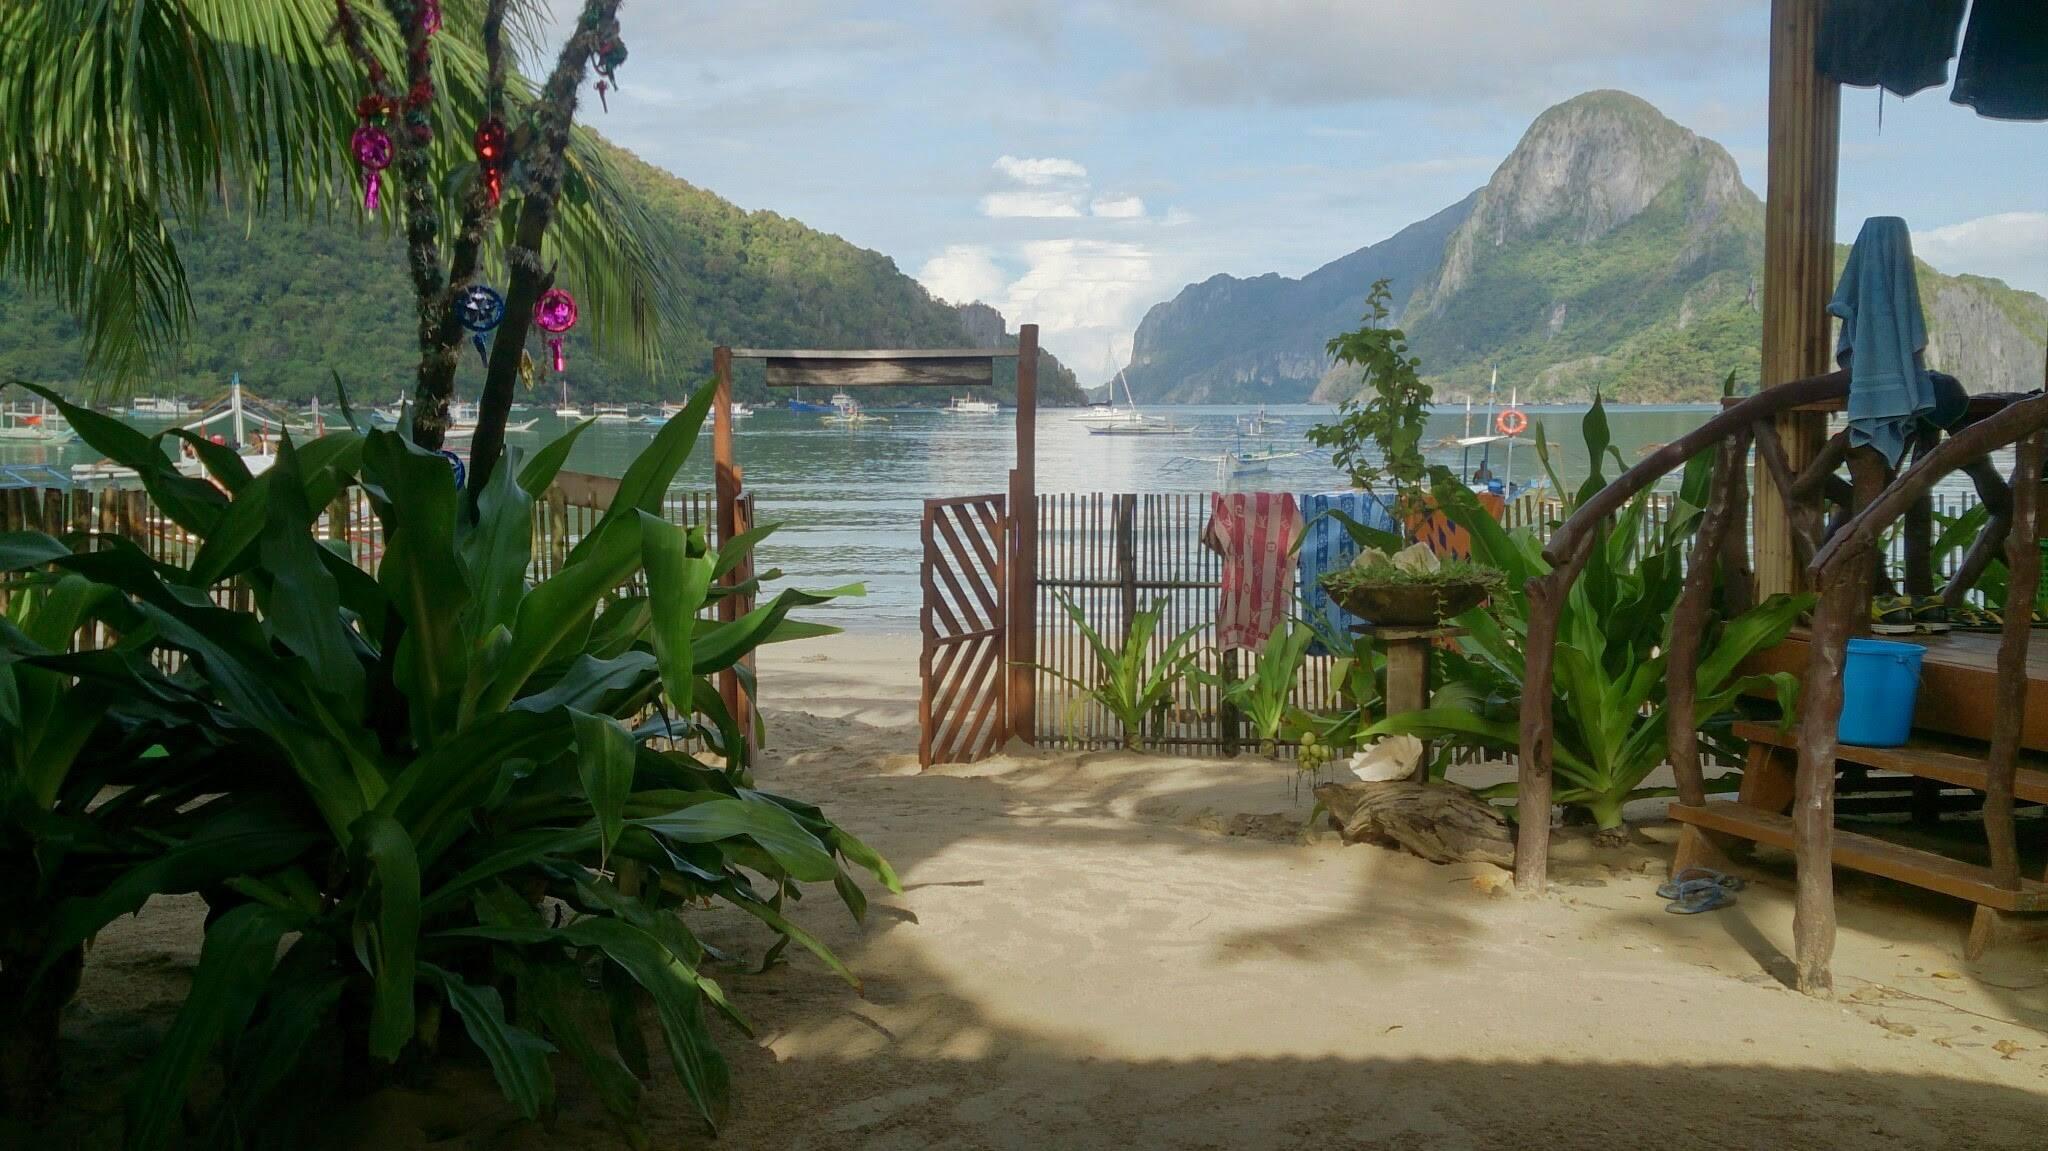 Zanimljivosti i nevjerojatan susret u El Nidu (Palawan, Filipini)